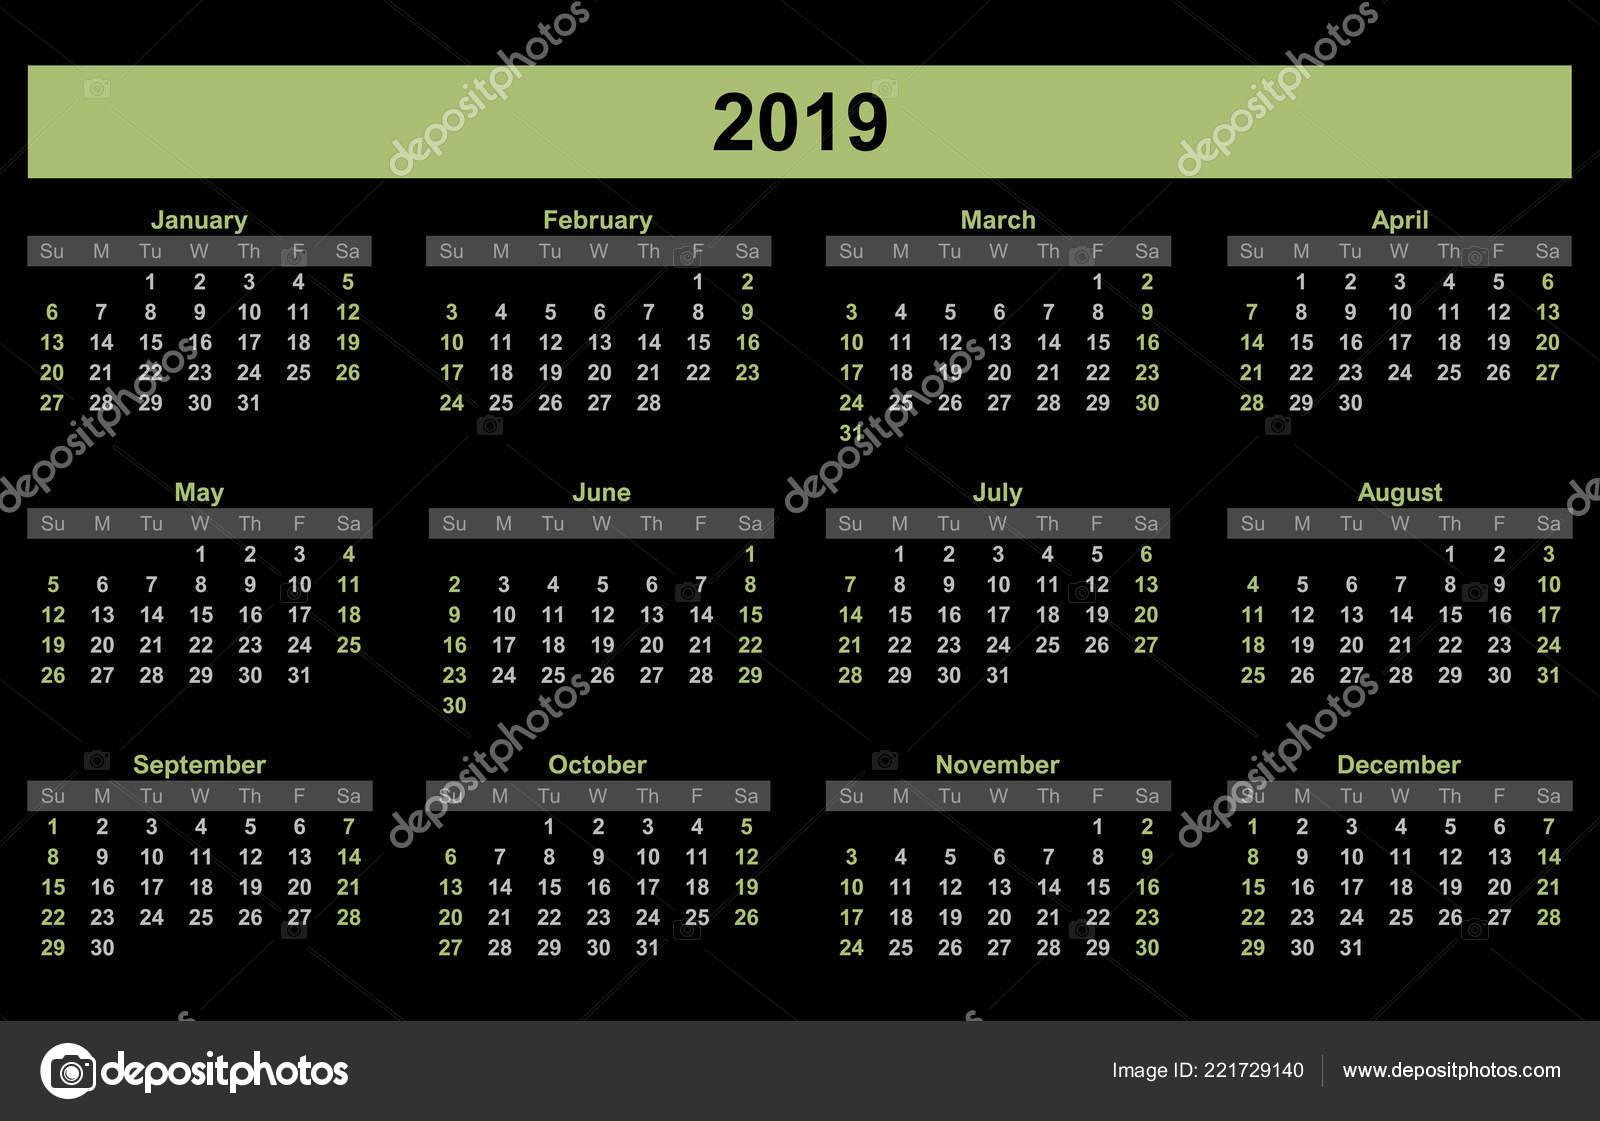 2019 Planner Calendar Schedule Organizer Companies Private Use